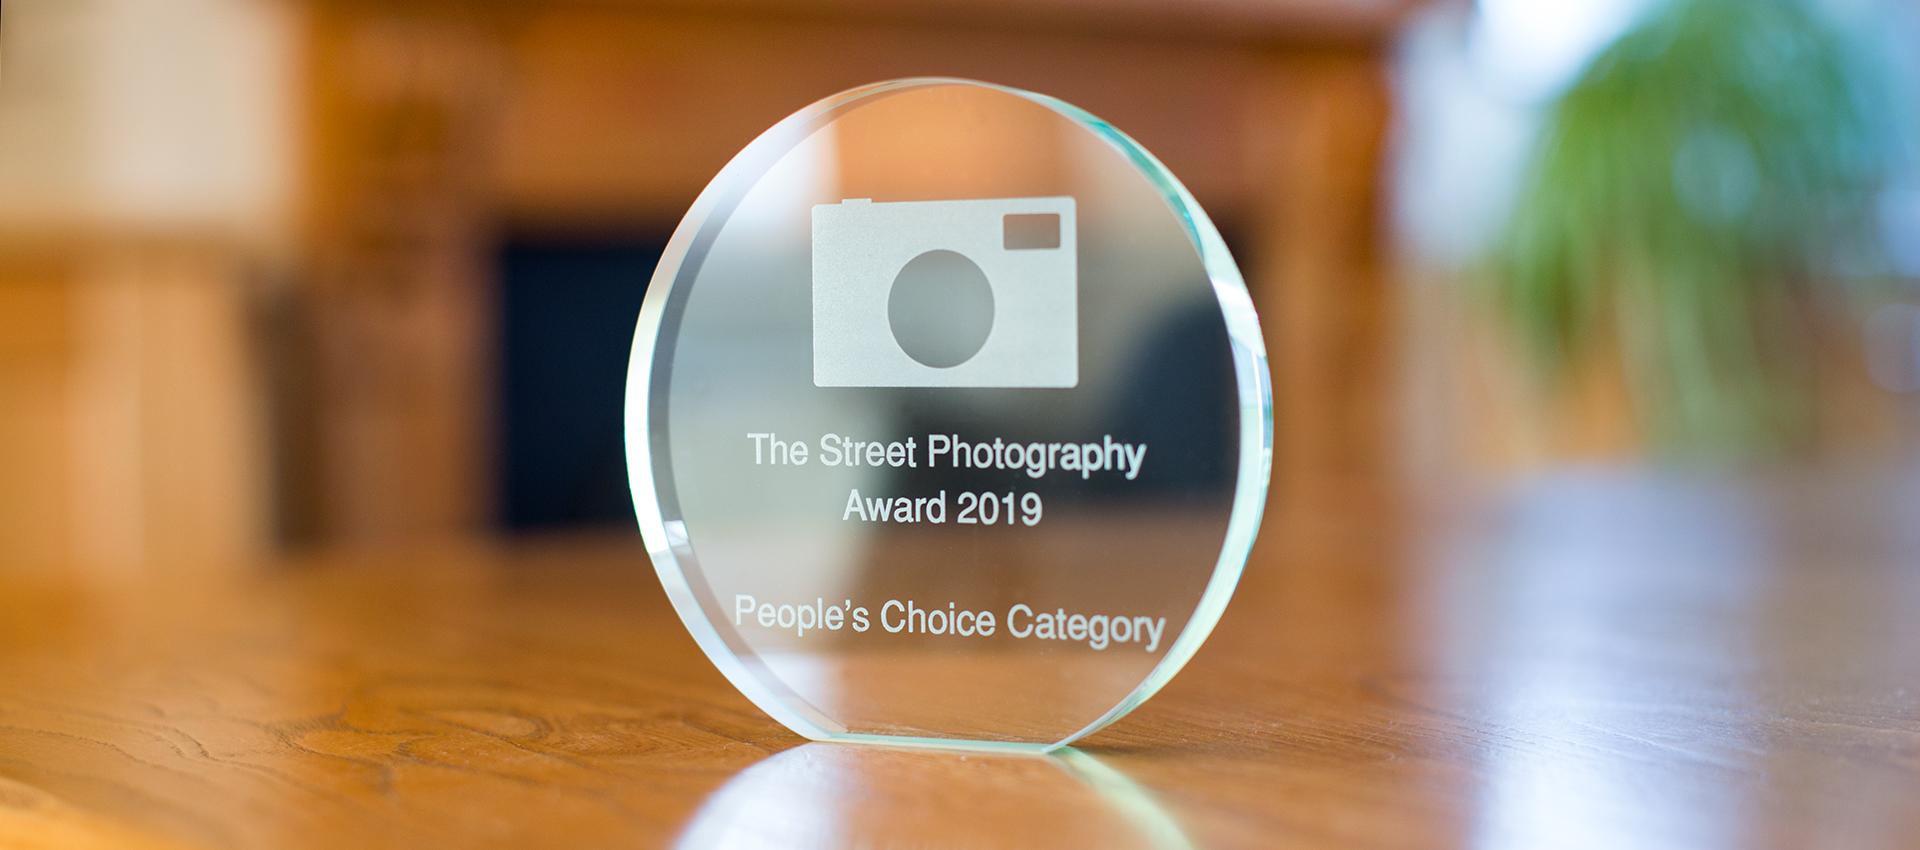 The Street Photography Award